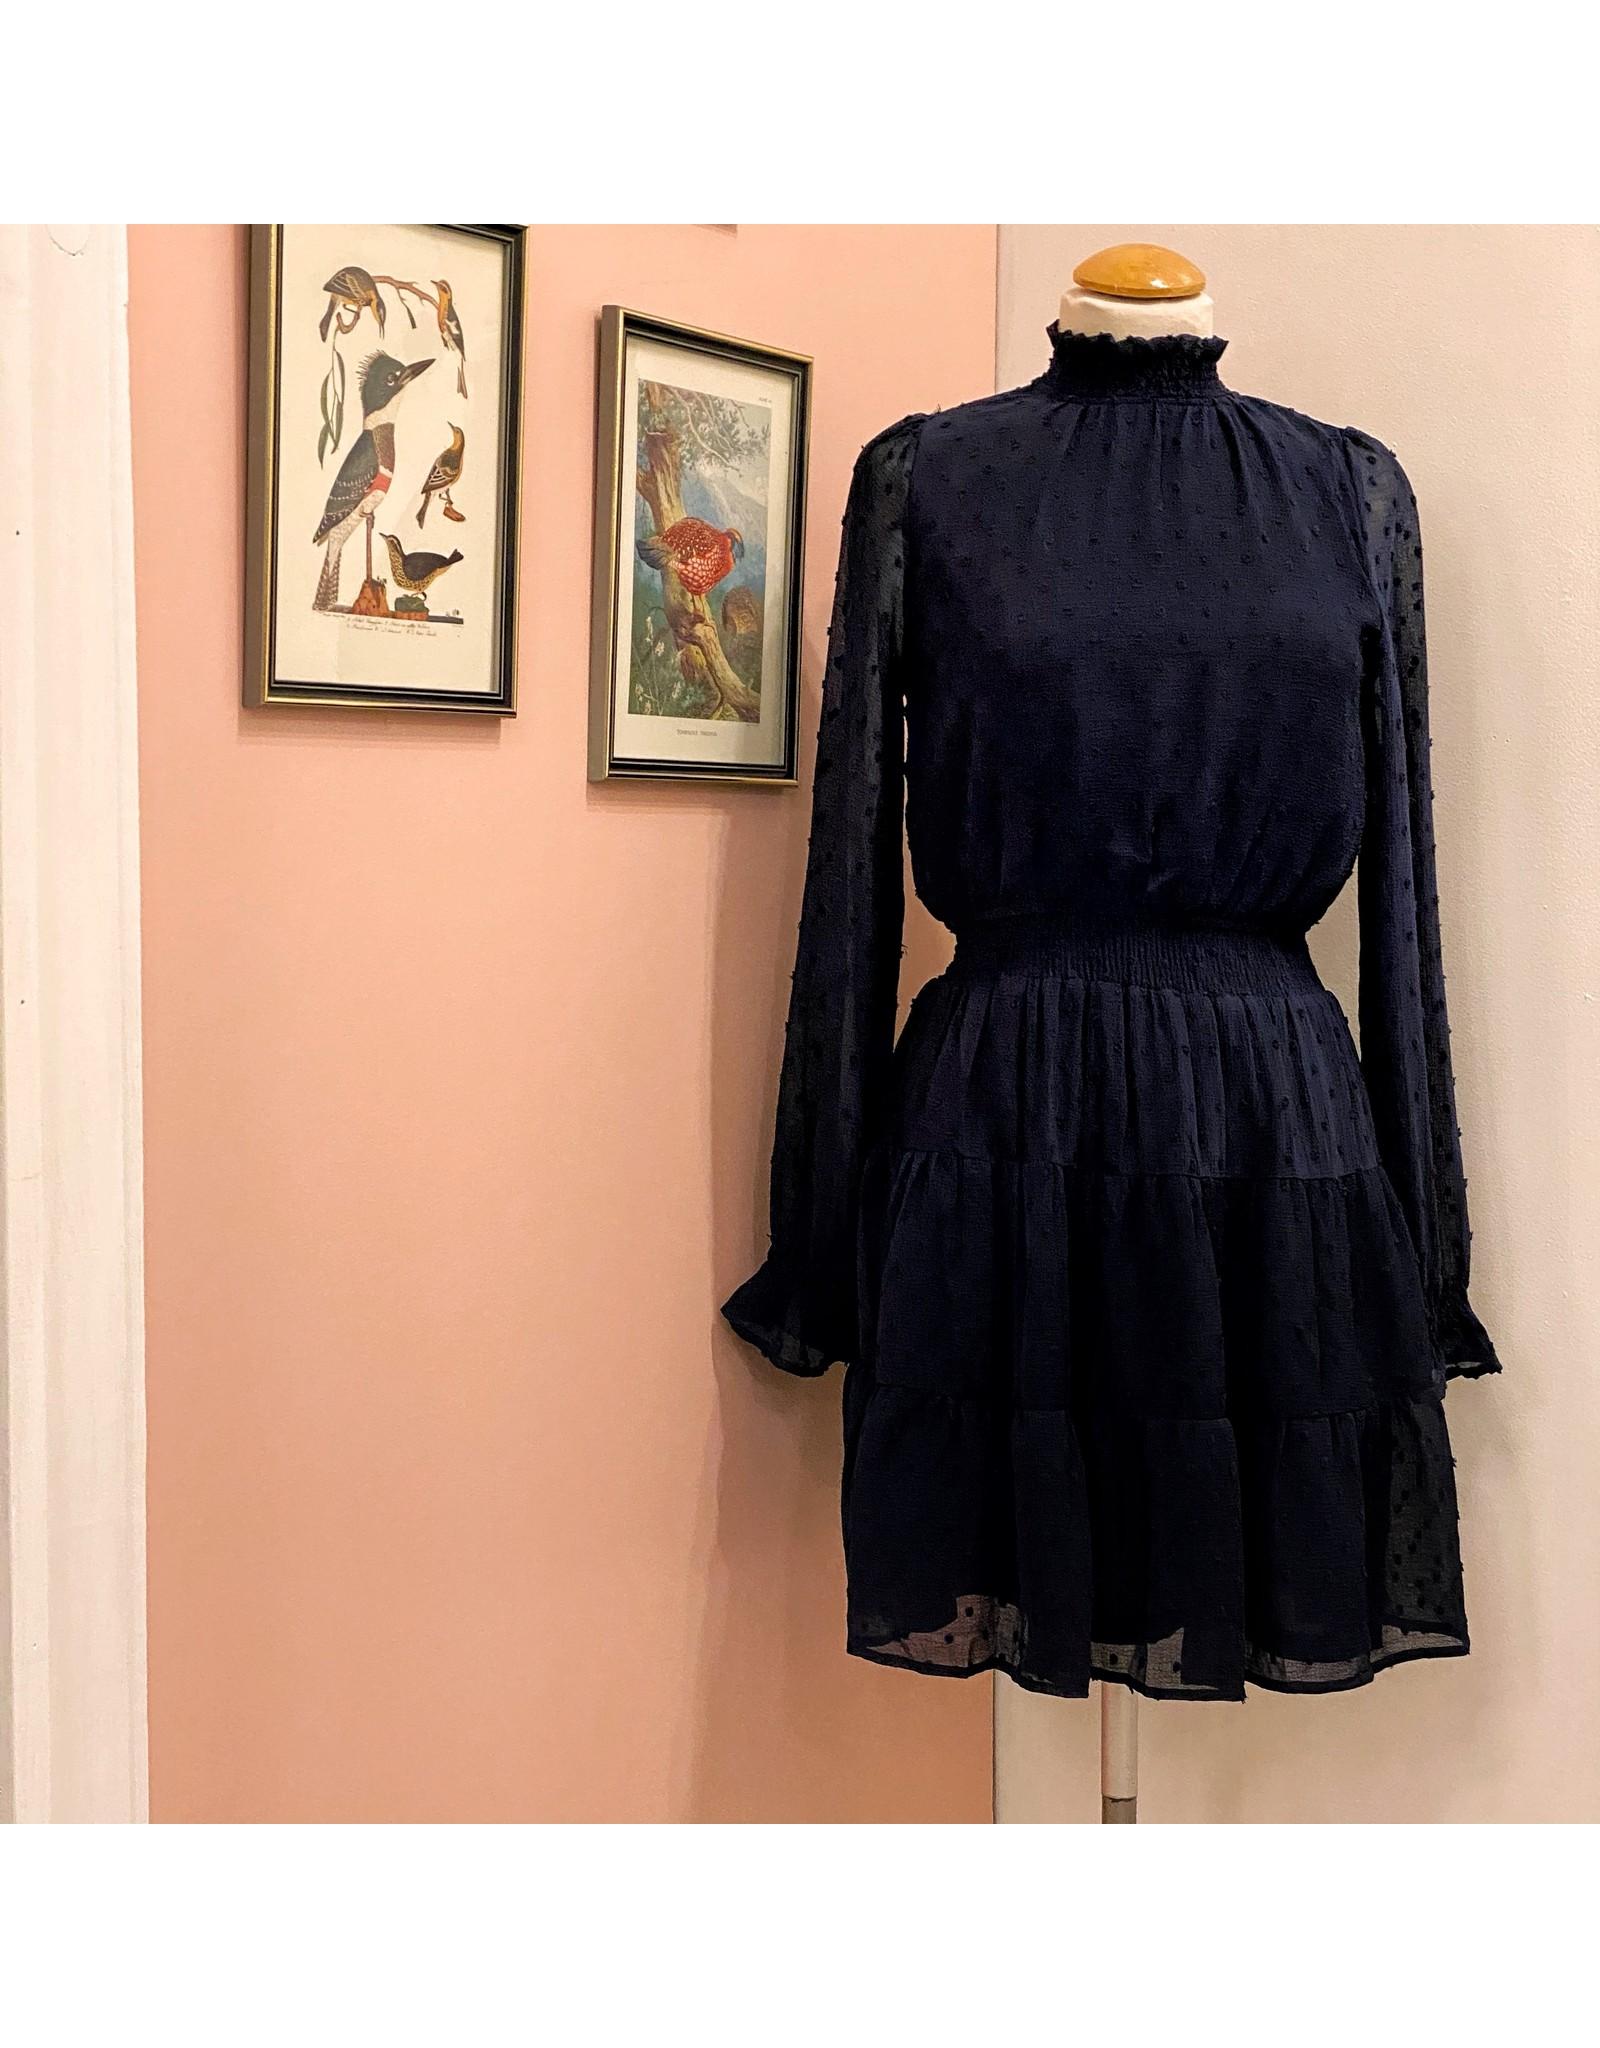 Bonanza - My Heart Dress